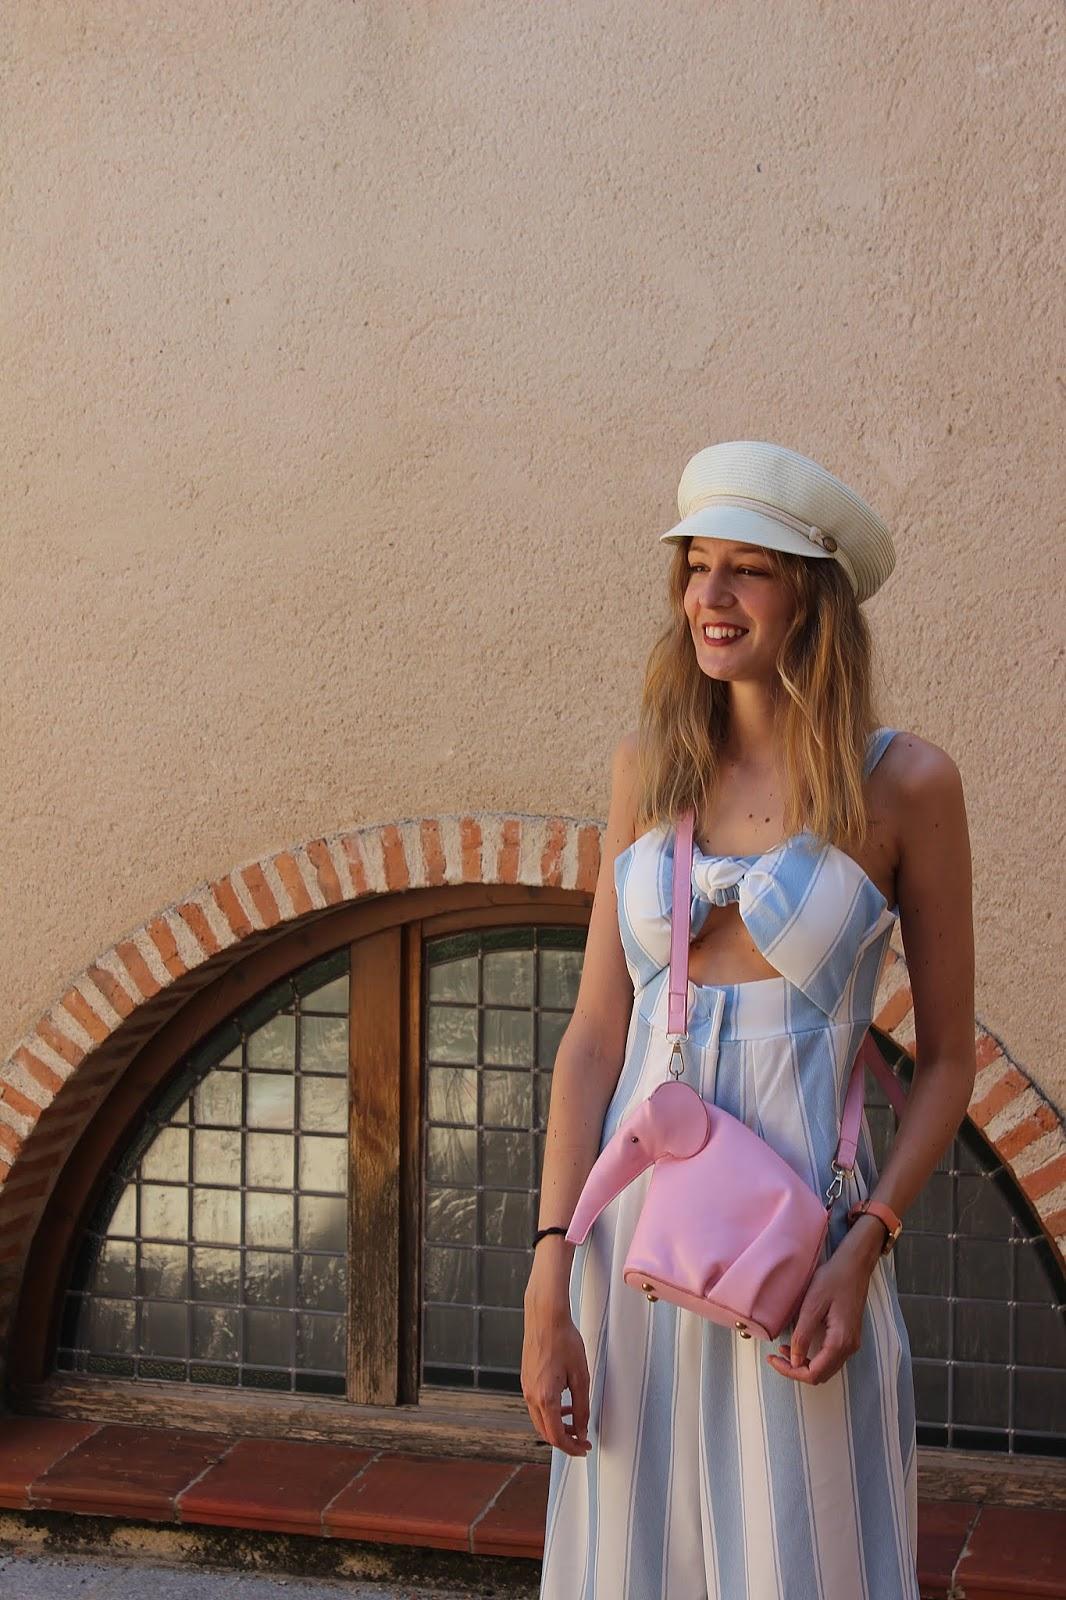 stripes-jumpsuit-baker-cap-espadrilles-loewe-elephant-bag